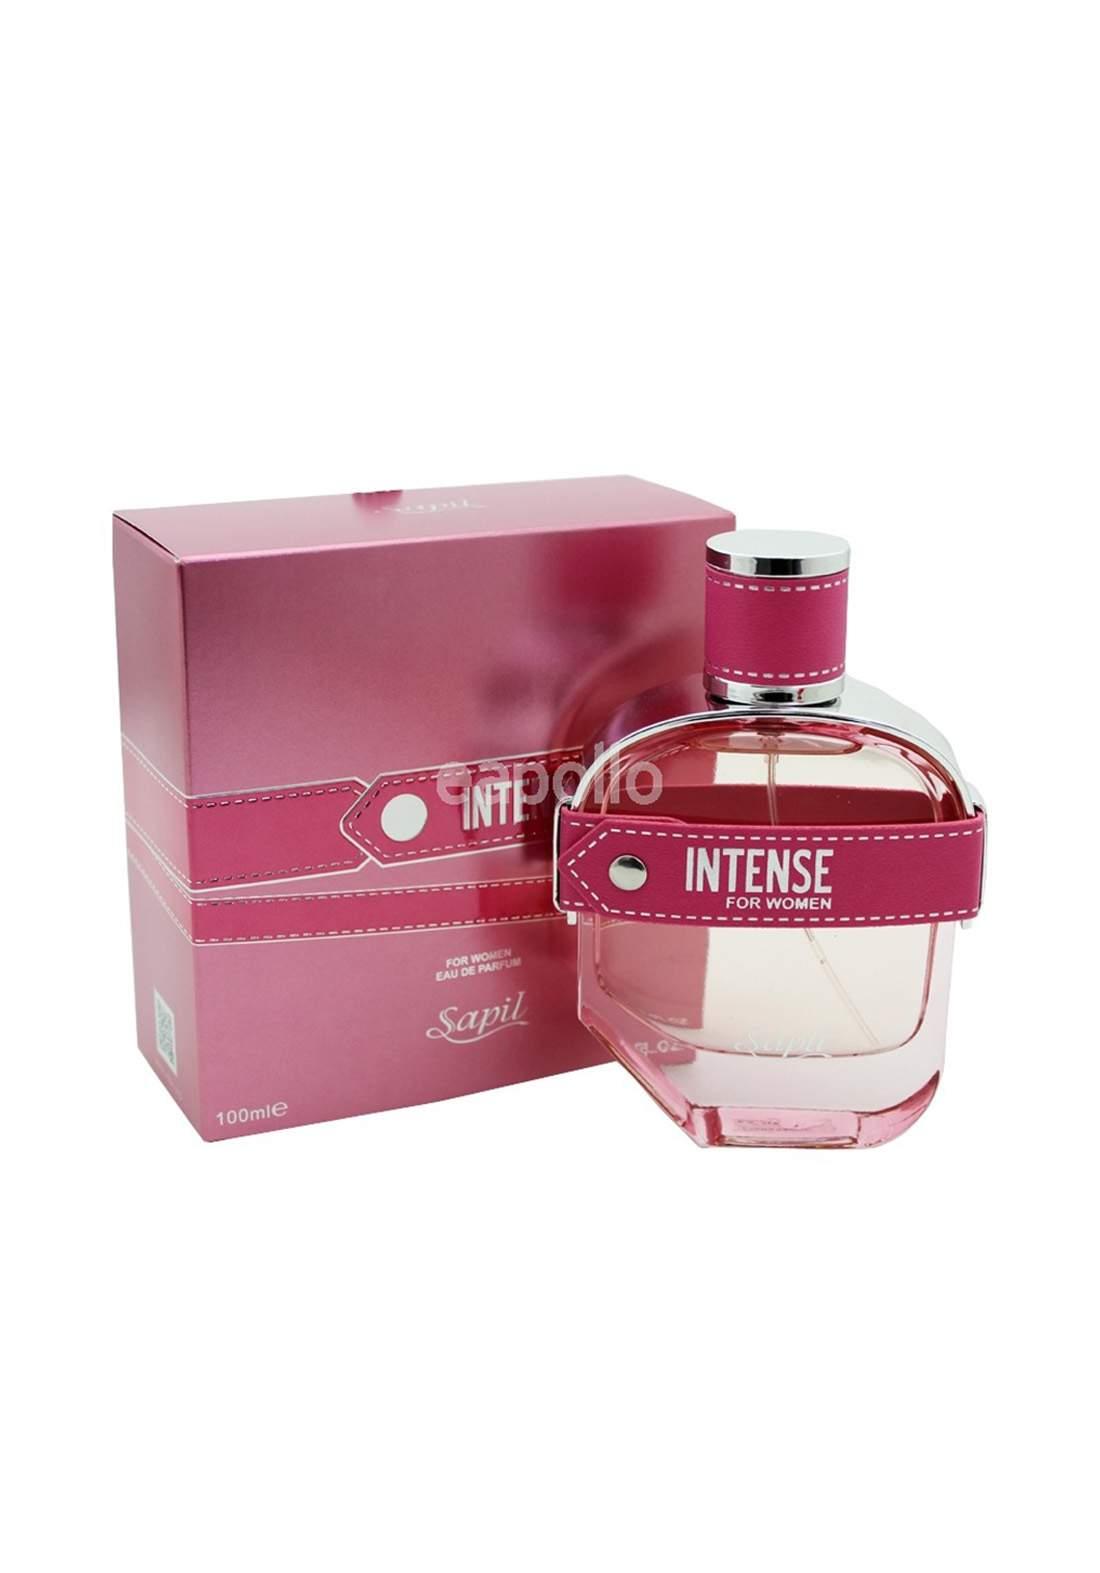 Sapil 1166 Intense Eau De Parfum Spray 100 ml For Women  عطر نسائي